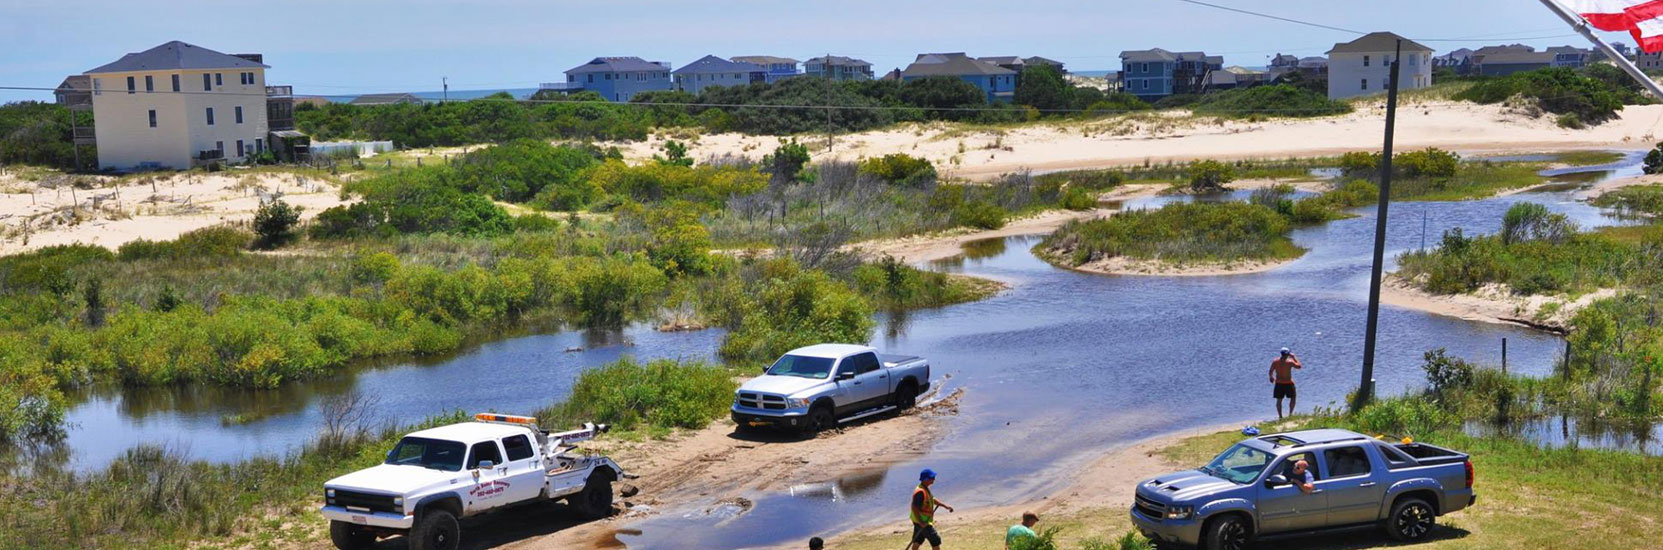 Carova Beach Towing Flood Recovery